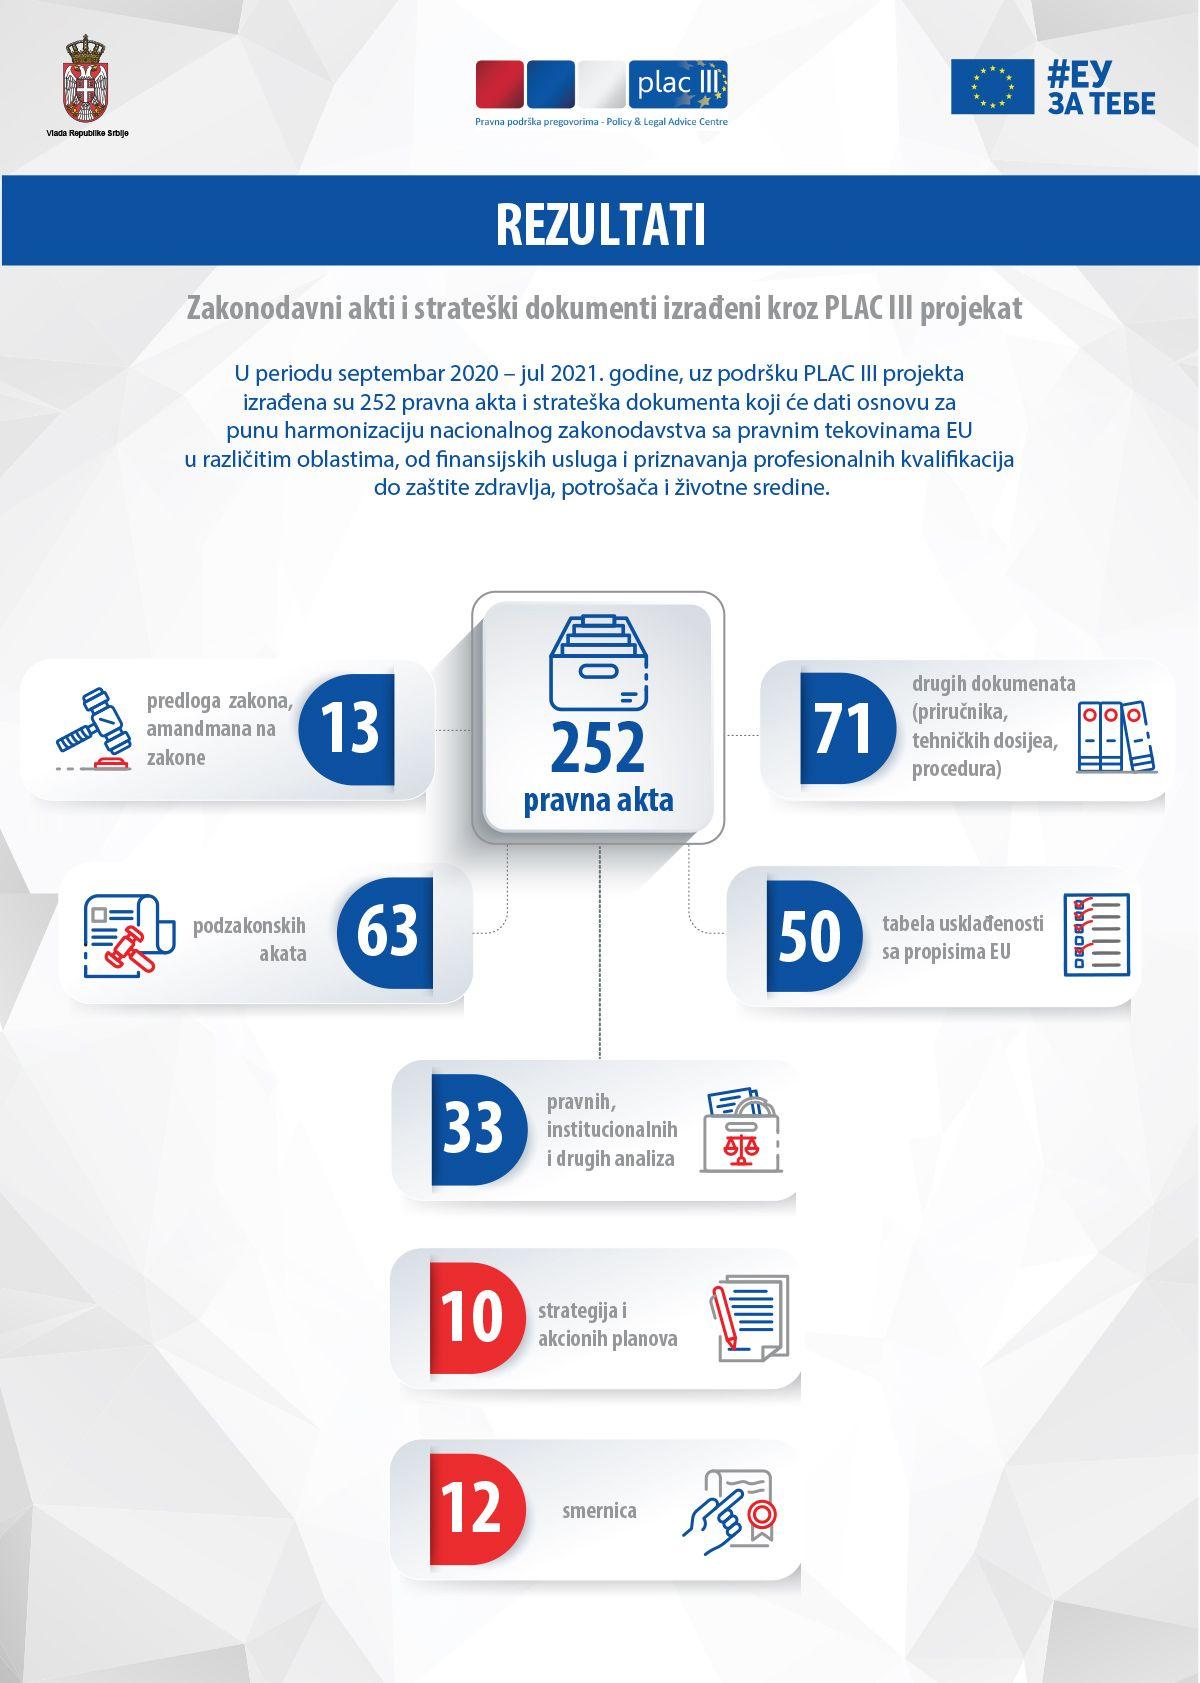 Infografik 5: Zakonodavni akti i strateški dokumenti izrađeni kroz PLAC III projekat